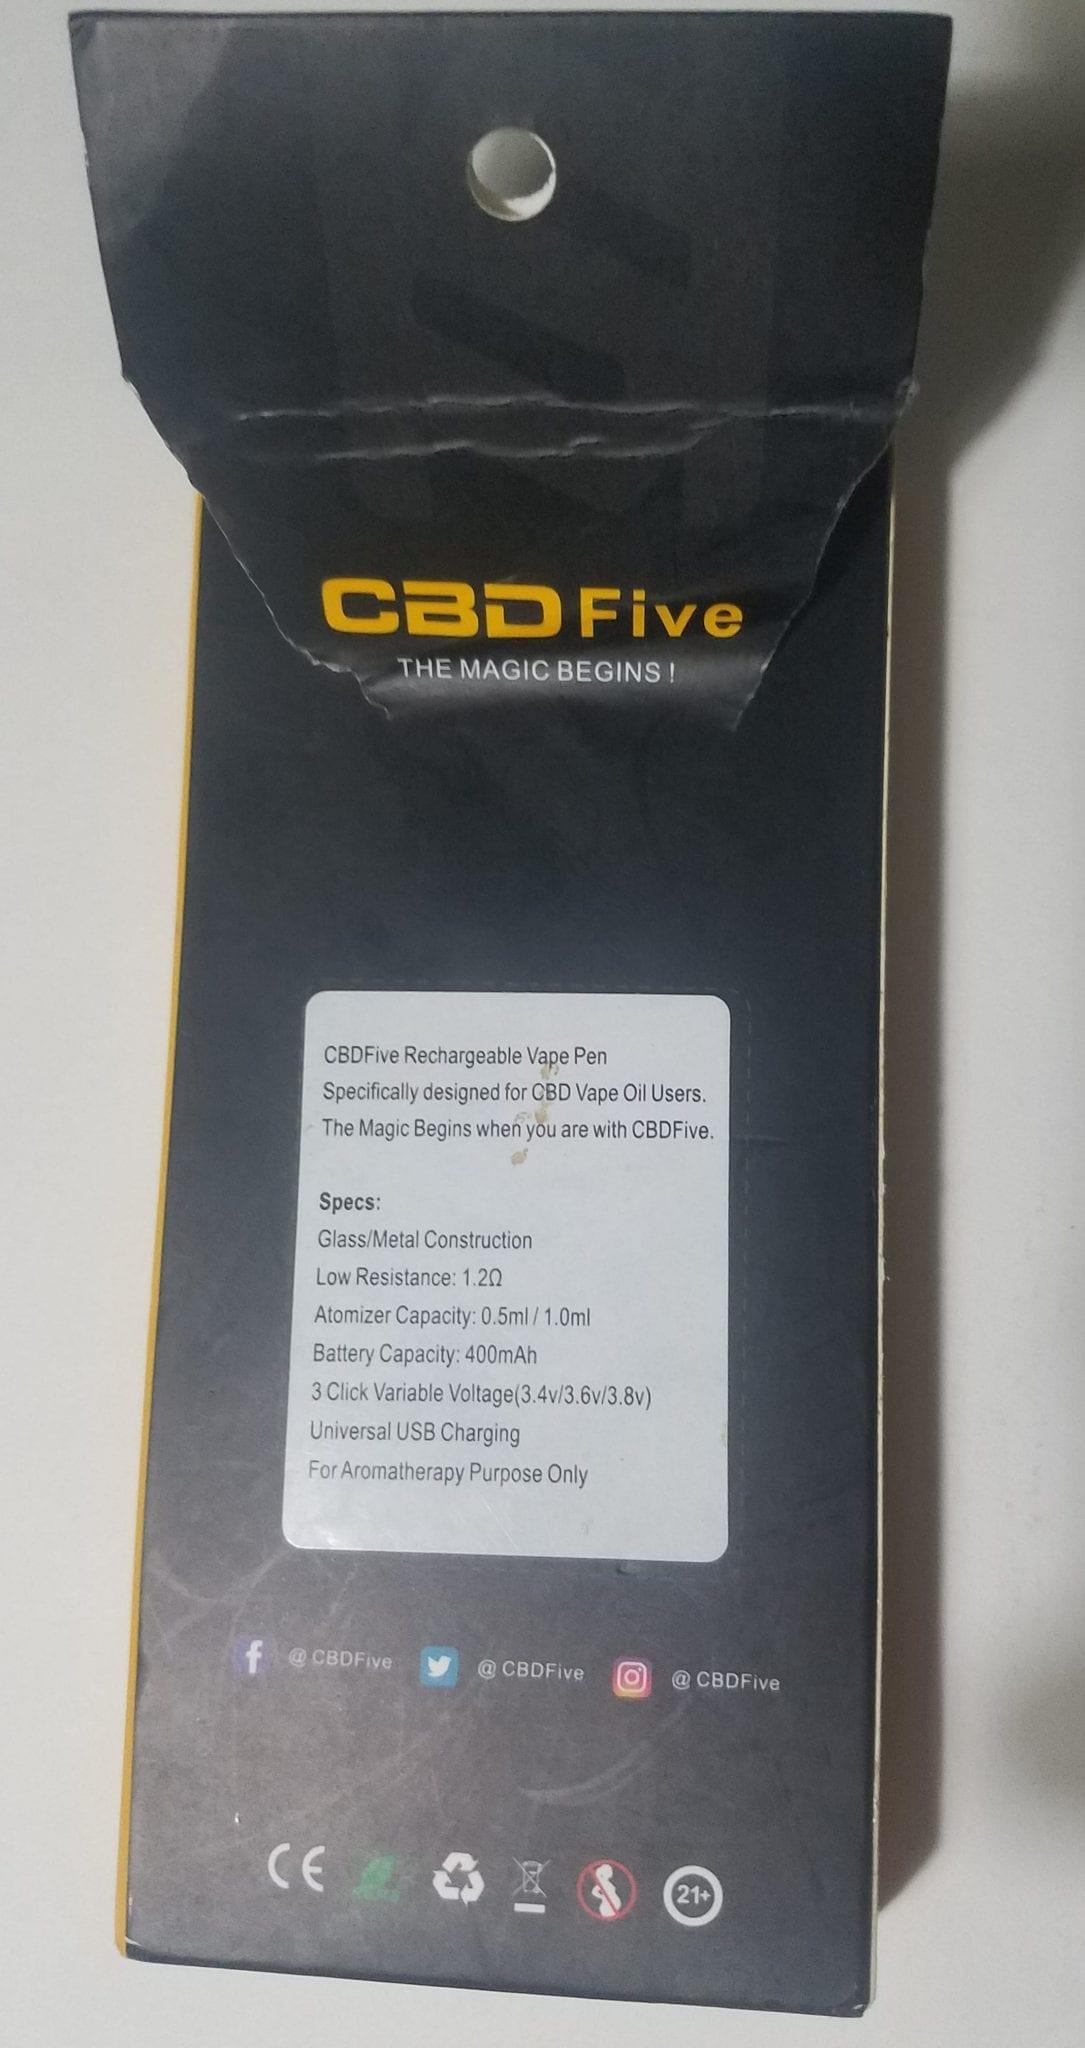 CBD5 exterior package text